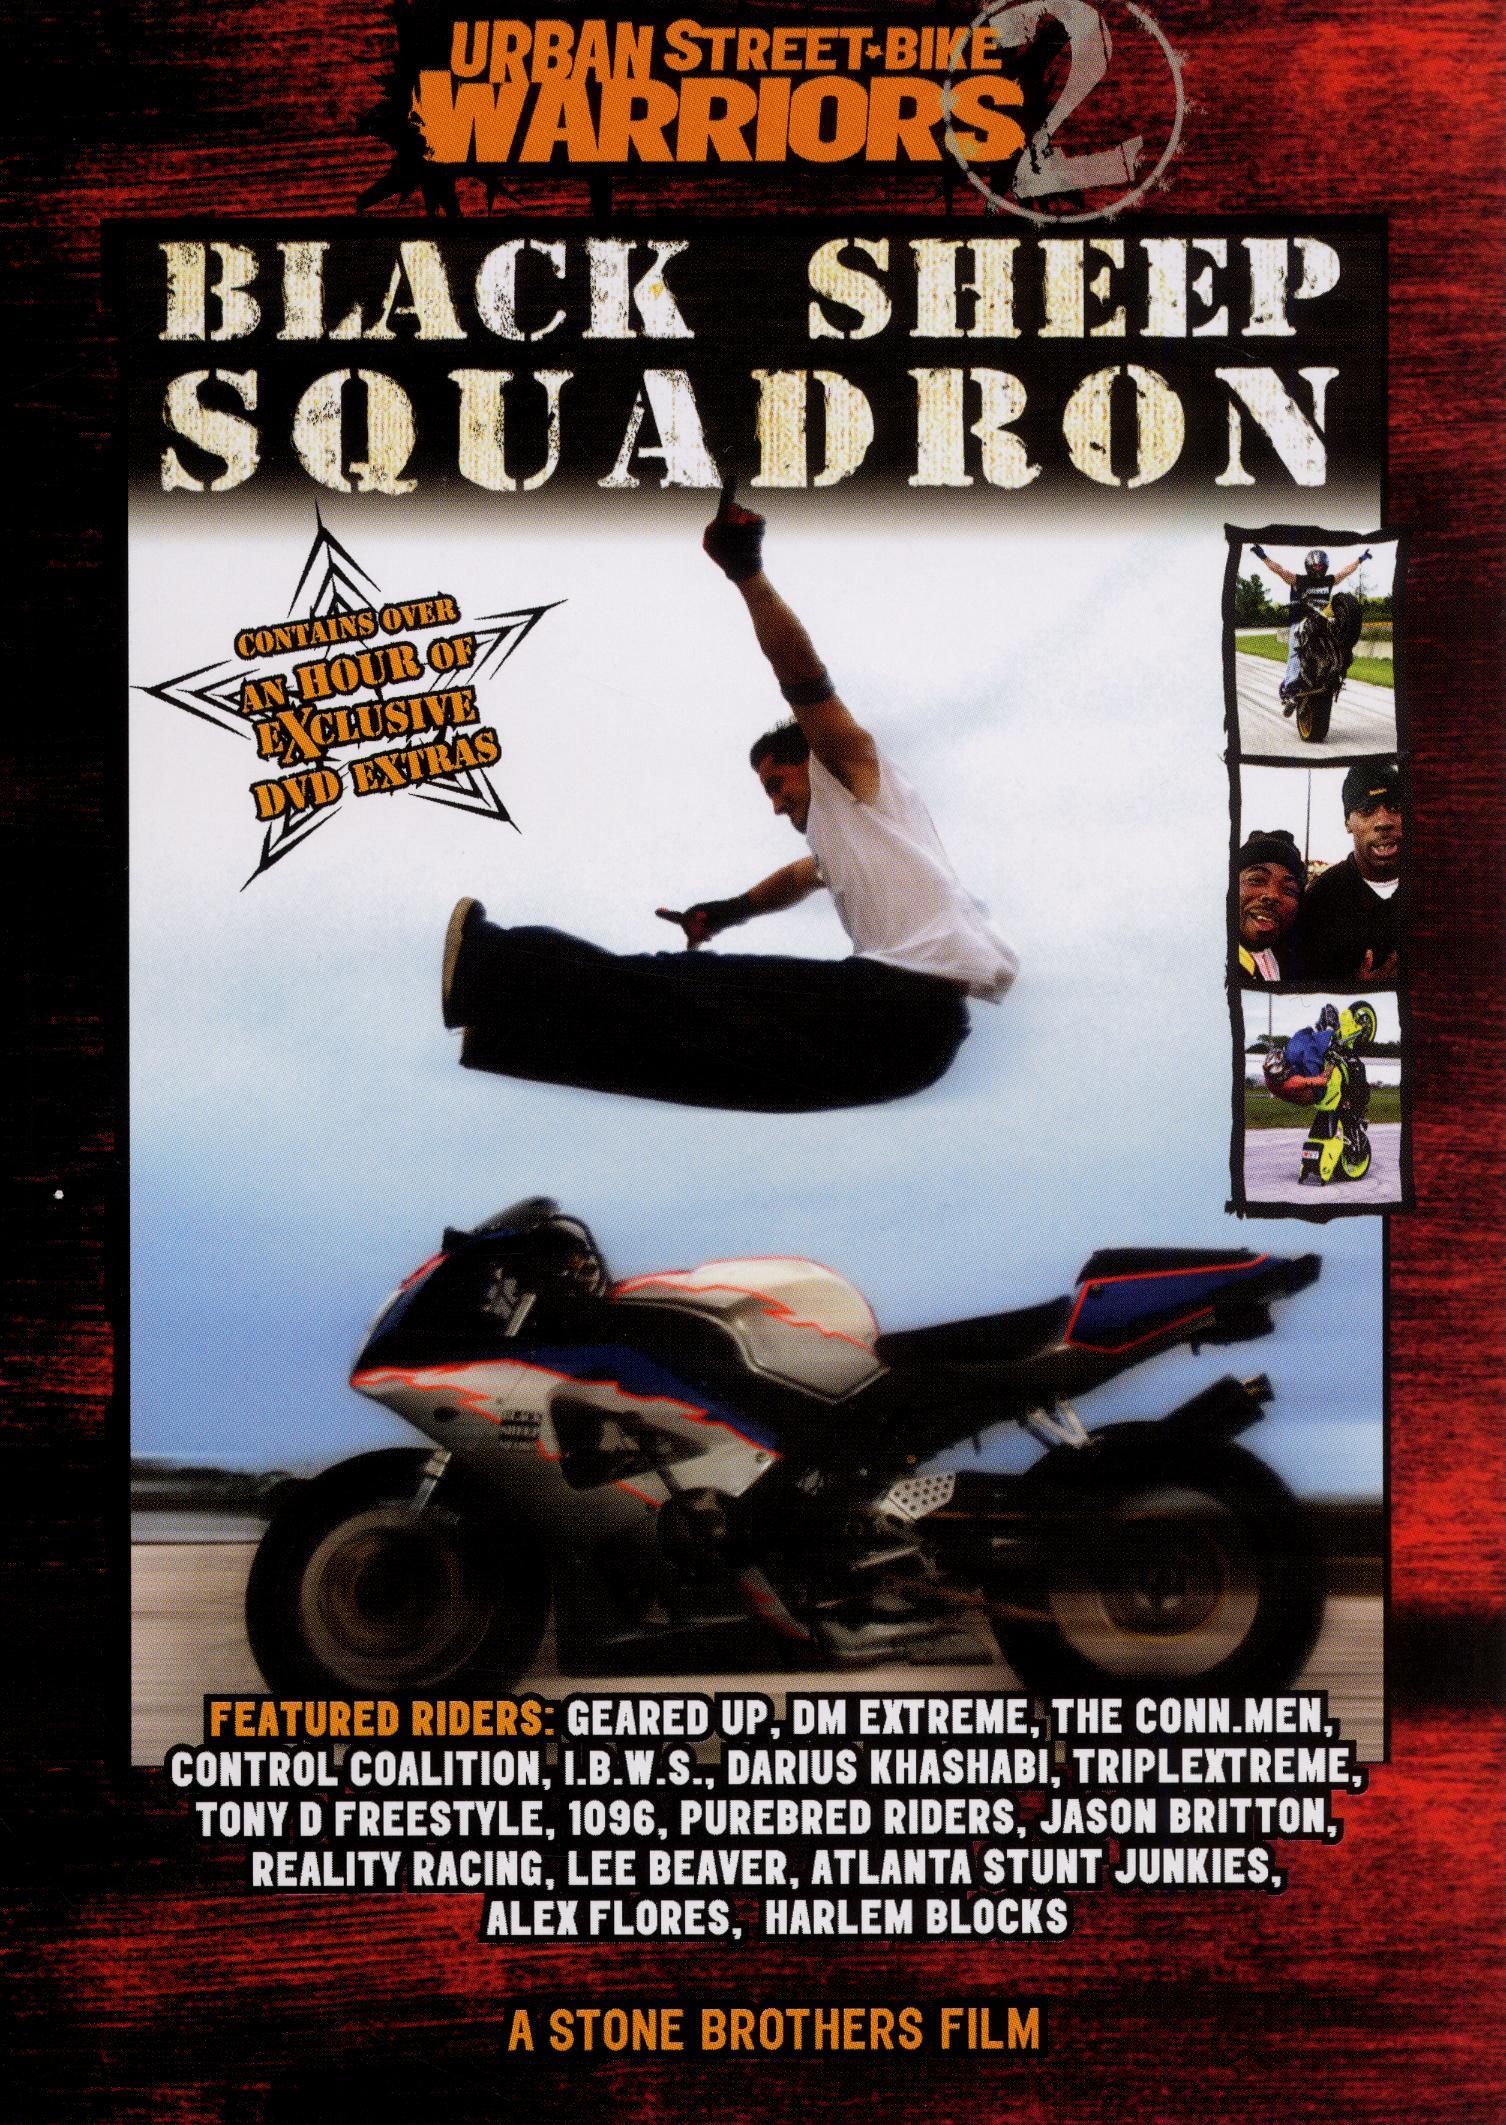 Urban Street-Bike Warriors, Vol. 2: Black Sheep Sqadron